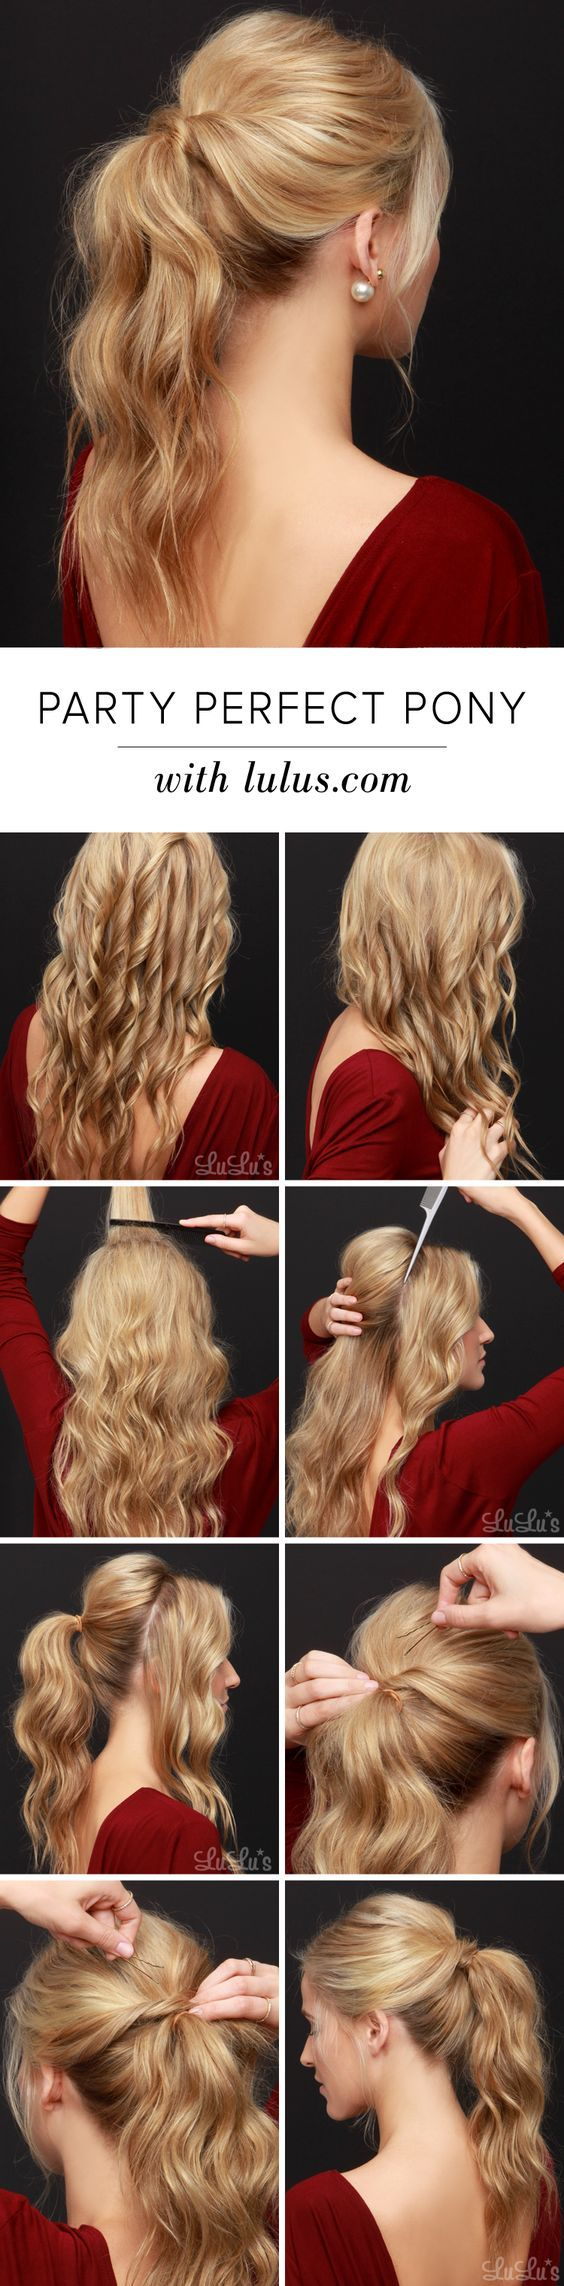 PerfectPonytail Hair style Makeup and Hair makeup